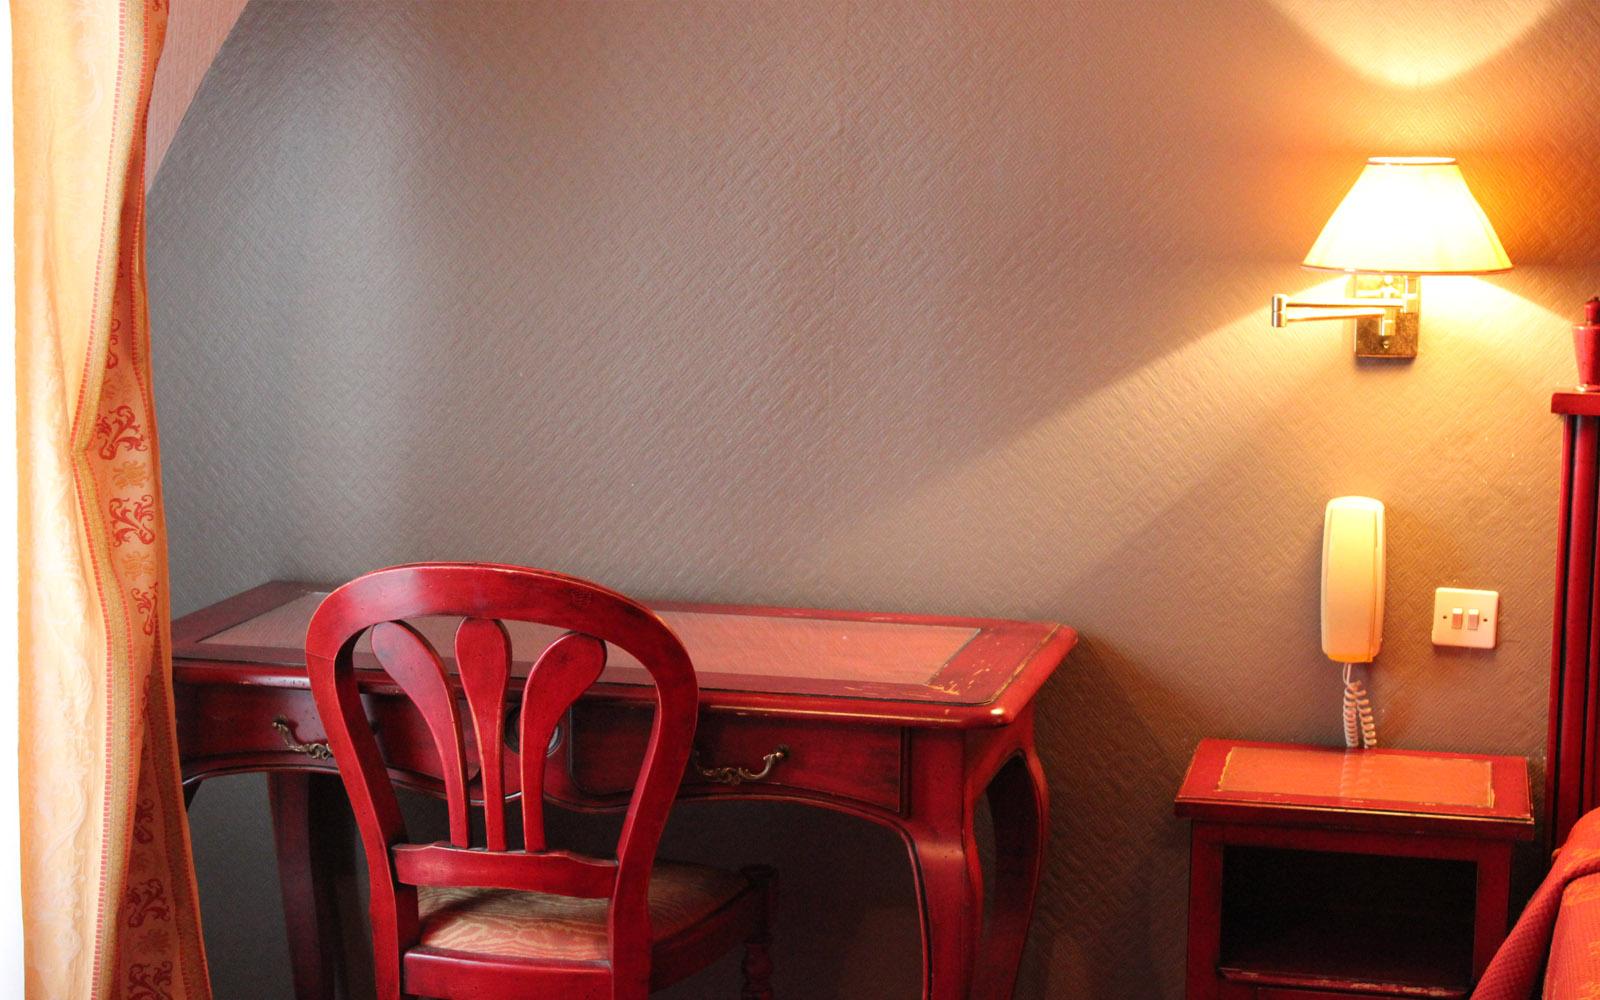 point rencontre gare nord paris. Black Bedroom Furniture Sets. Home Design Ideas